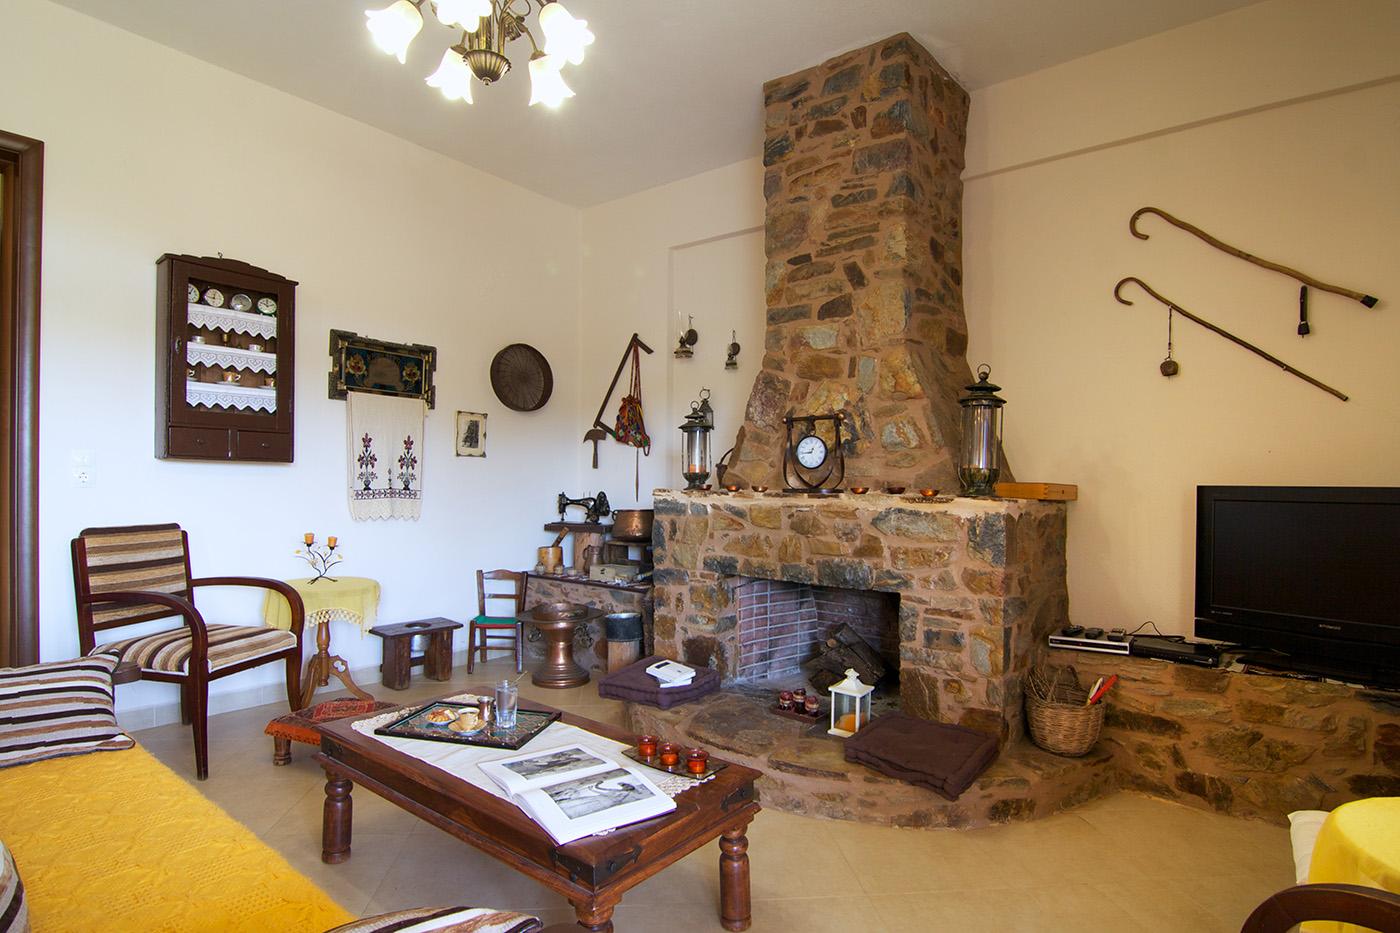 Indoors - Livingroom